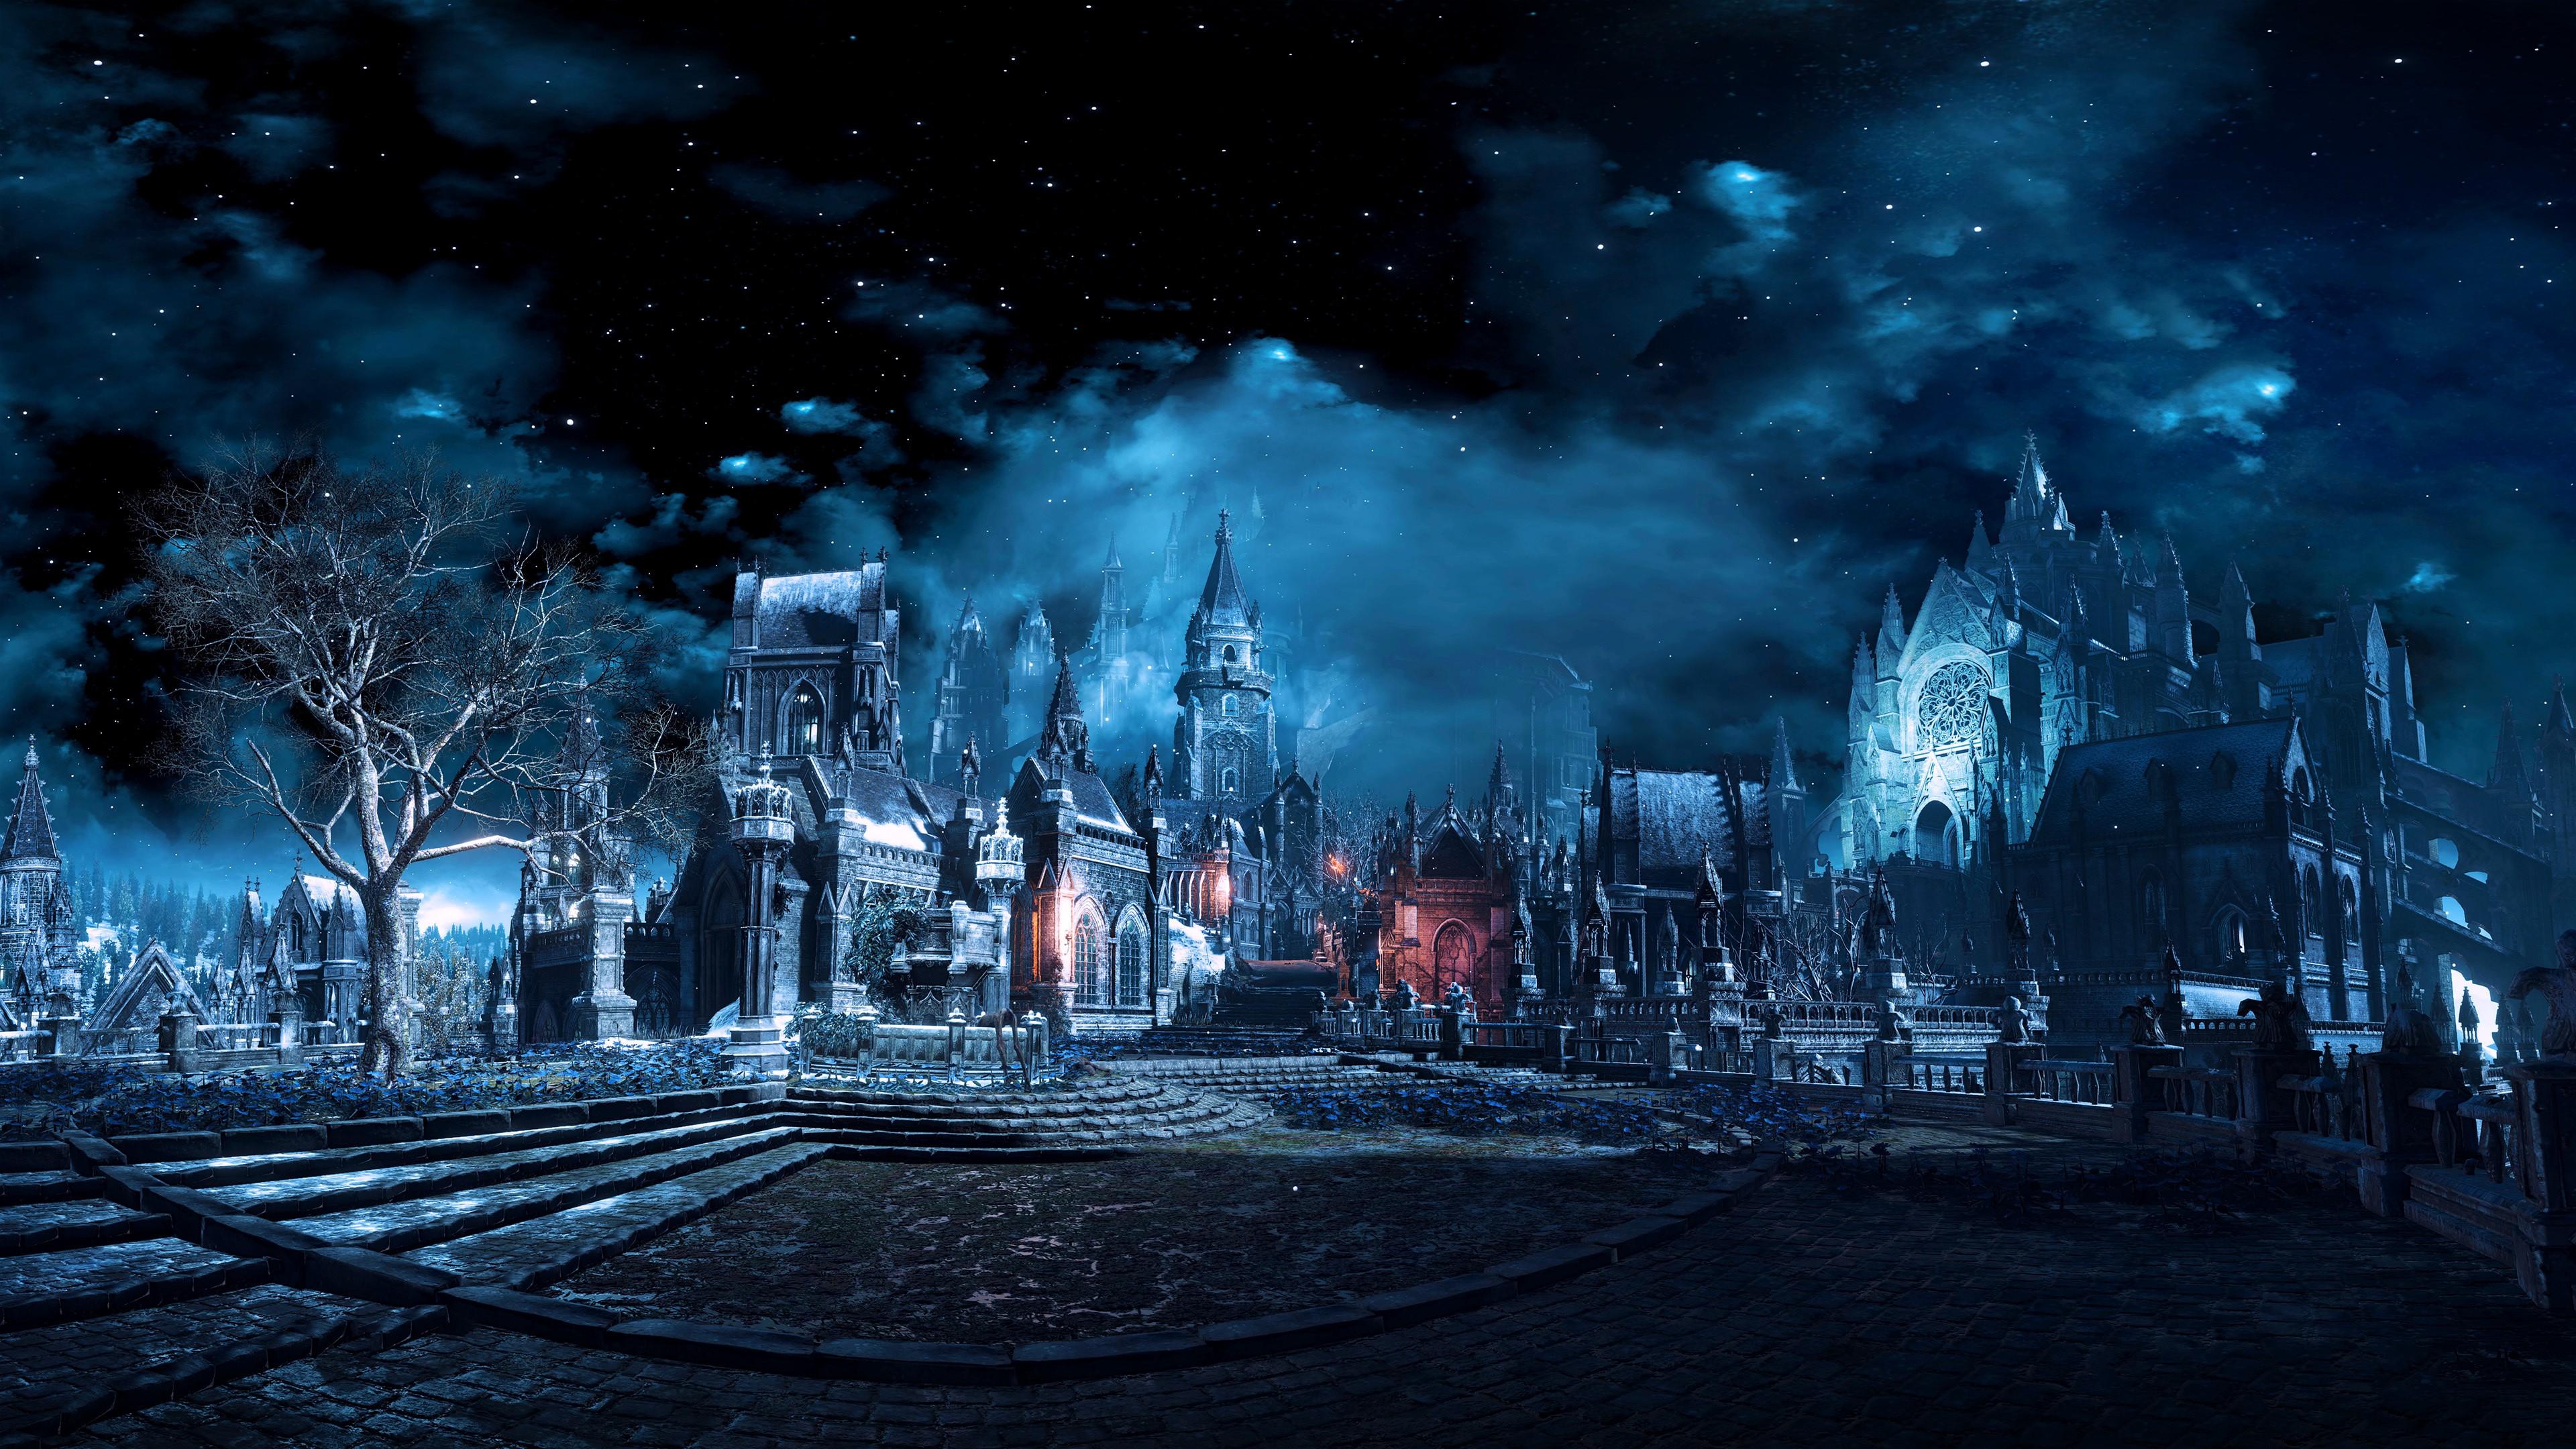 Fantastic Wallpaper Night Dark - video-games-night-Dark-Souls-III-Dark-Souls-midnight-light-darkness-screenshot-computer-wallpaper-29946  Graphic.jpg